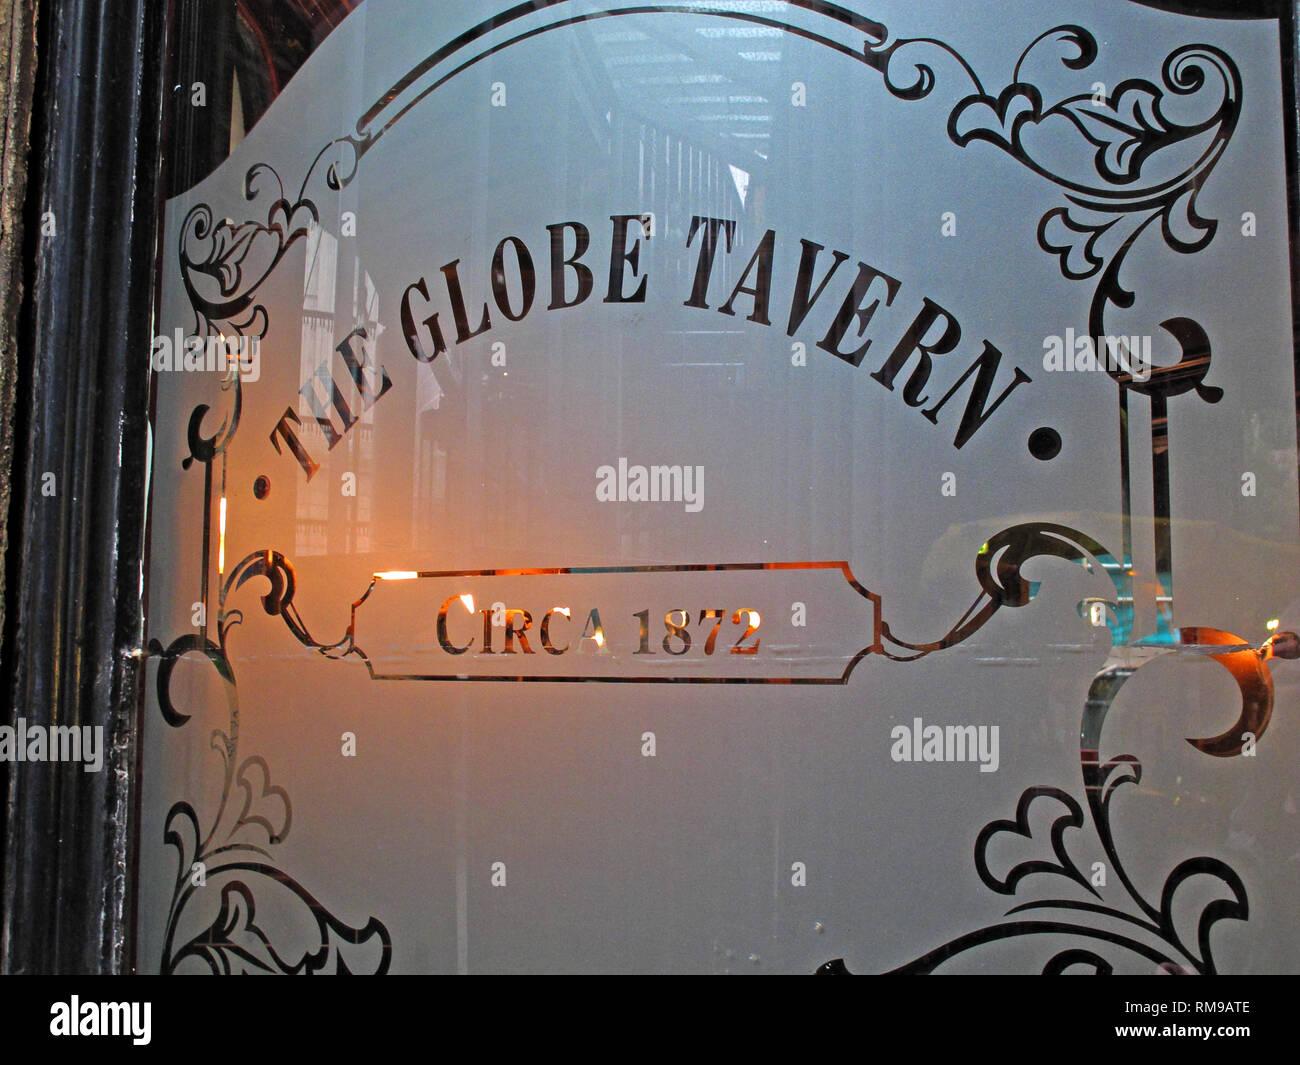 The Globe Tavern Circa 1872 pub, 8 Bedale St, London, England, UK,  SE1 9AL - Stock Image